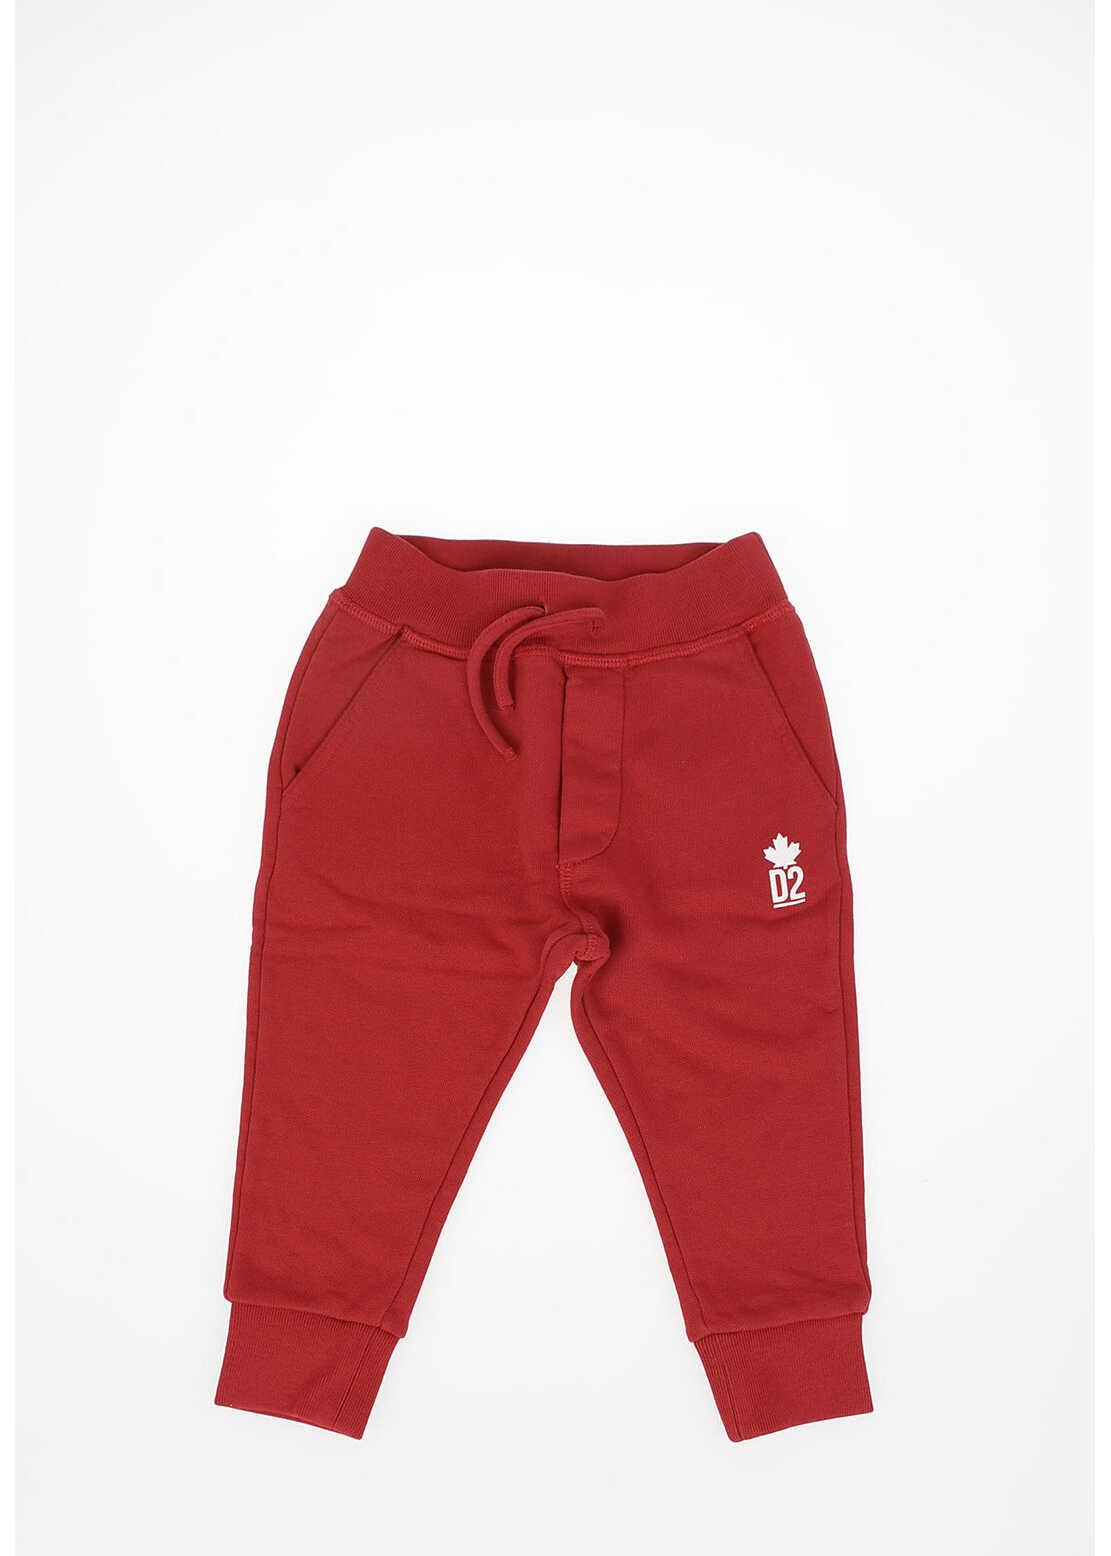 Dsquared2 Kids Drawstring Jogger Pants RED